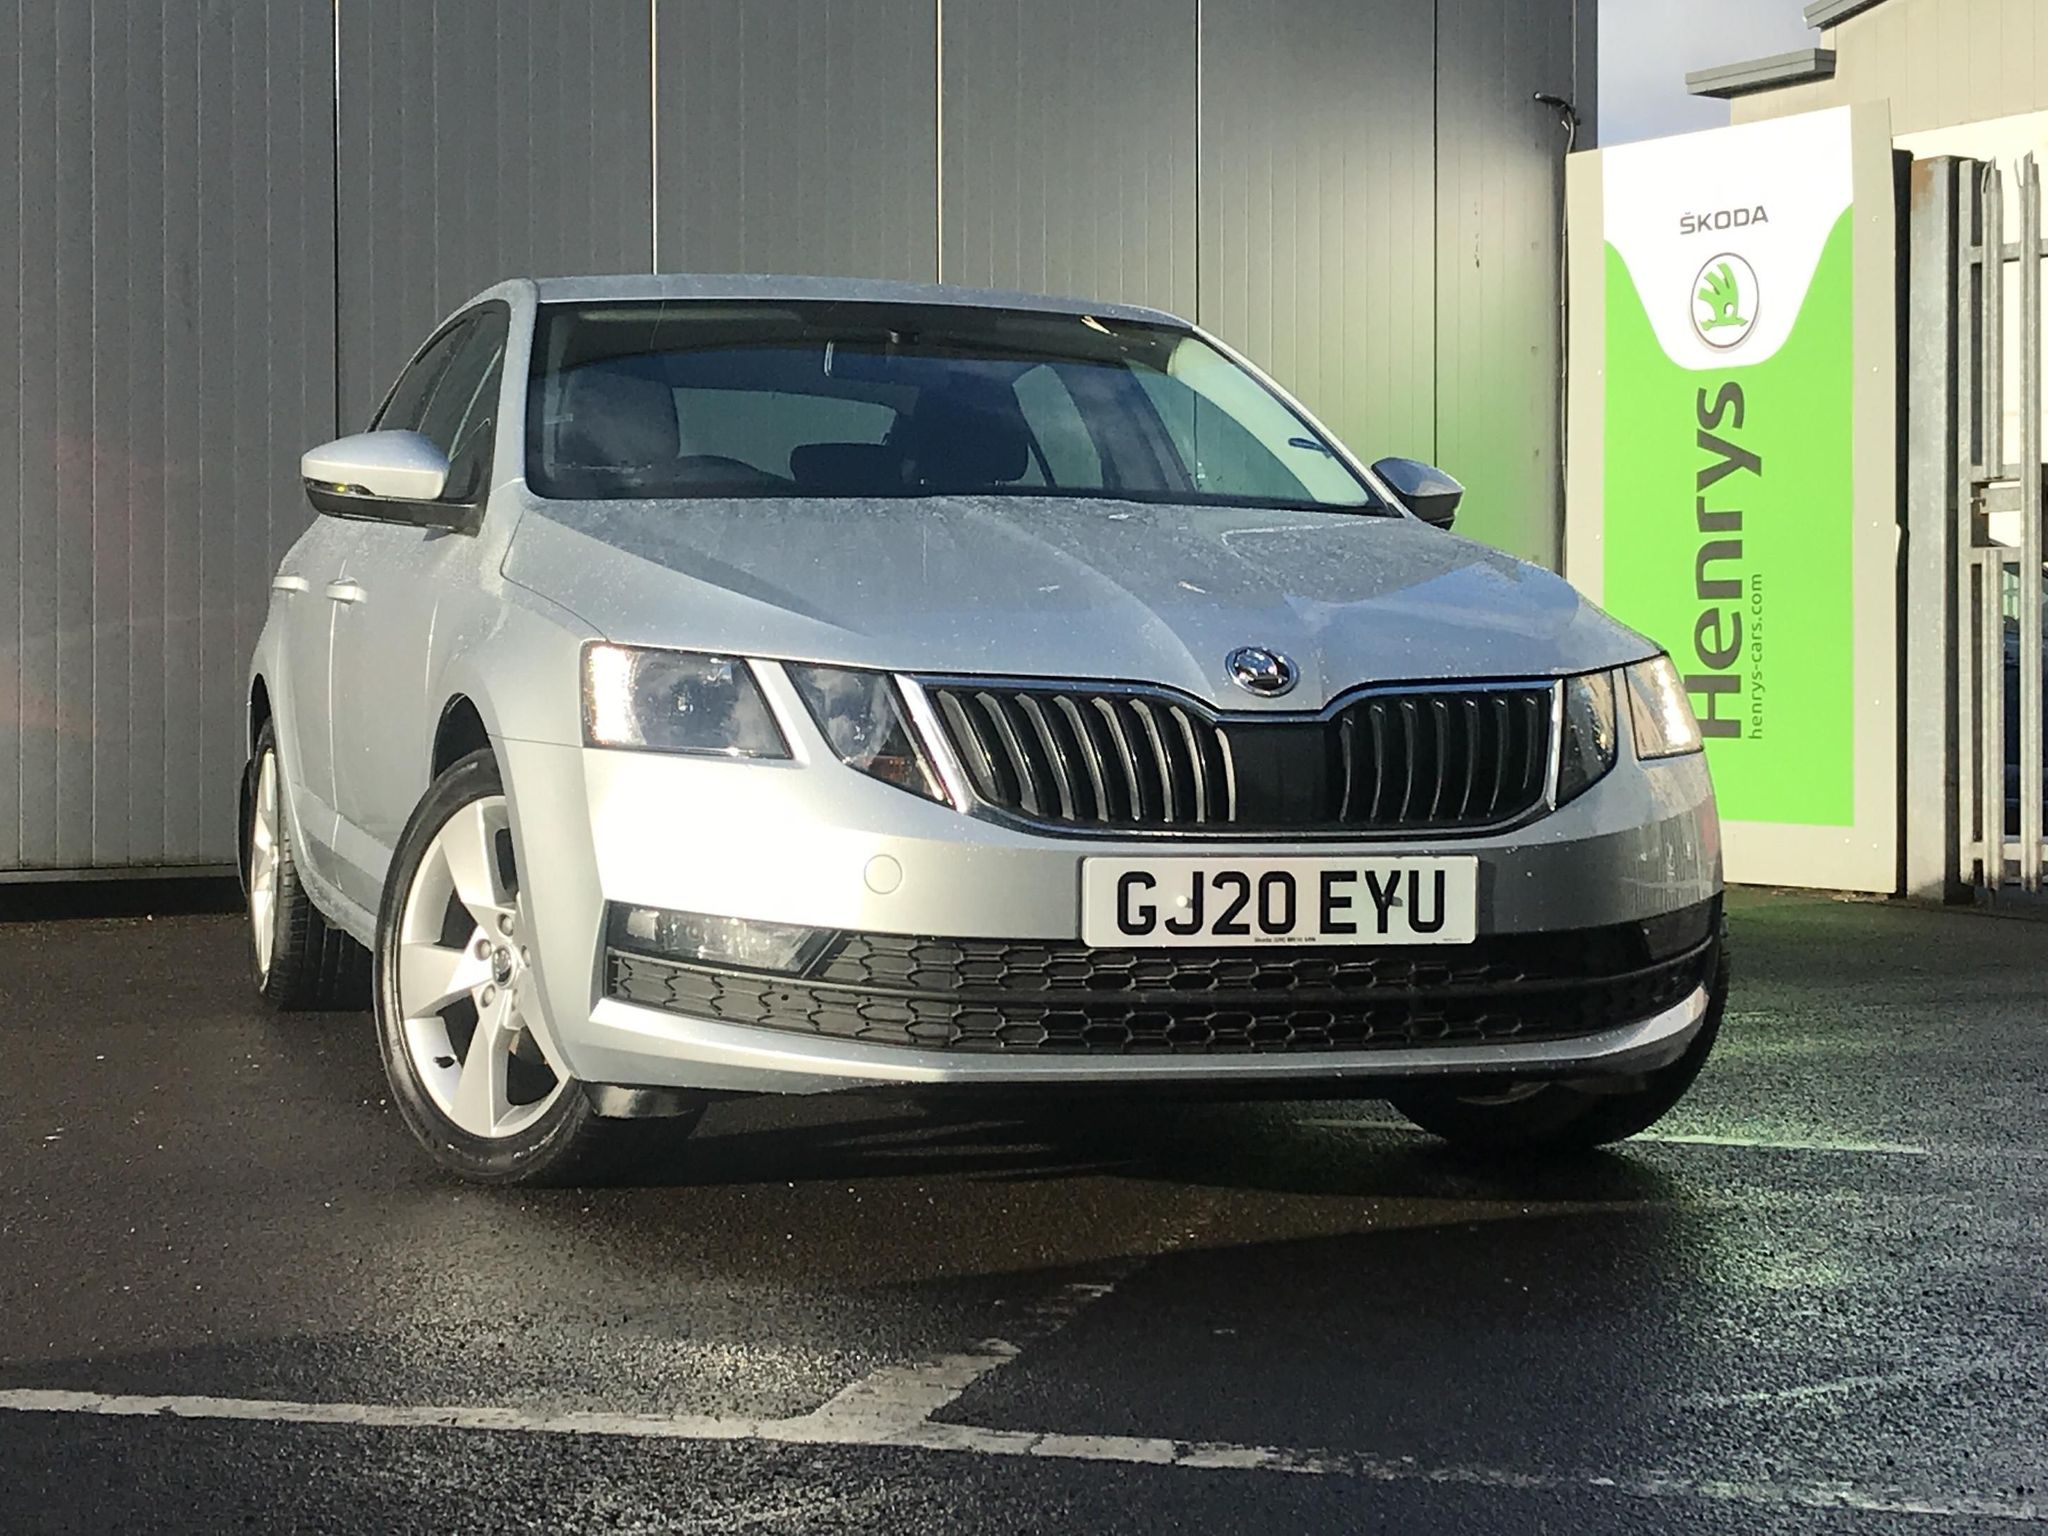 ŠKODA OCTAVIA SE DRIVE TDI Hatchback 1.6TDI SE Drive SCR (115ps)